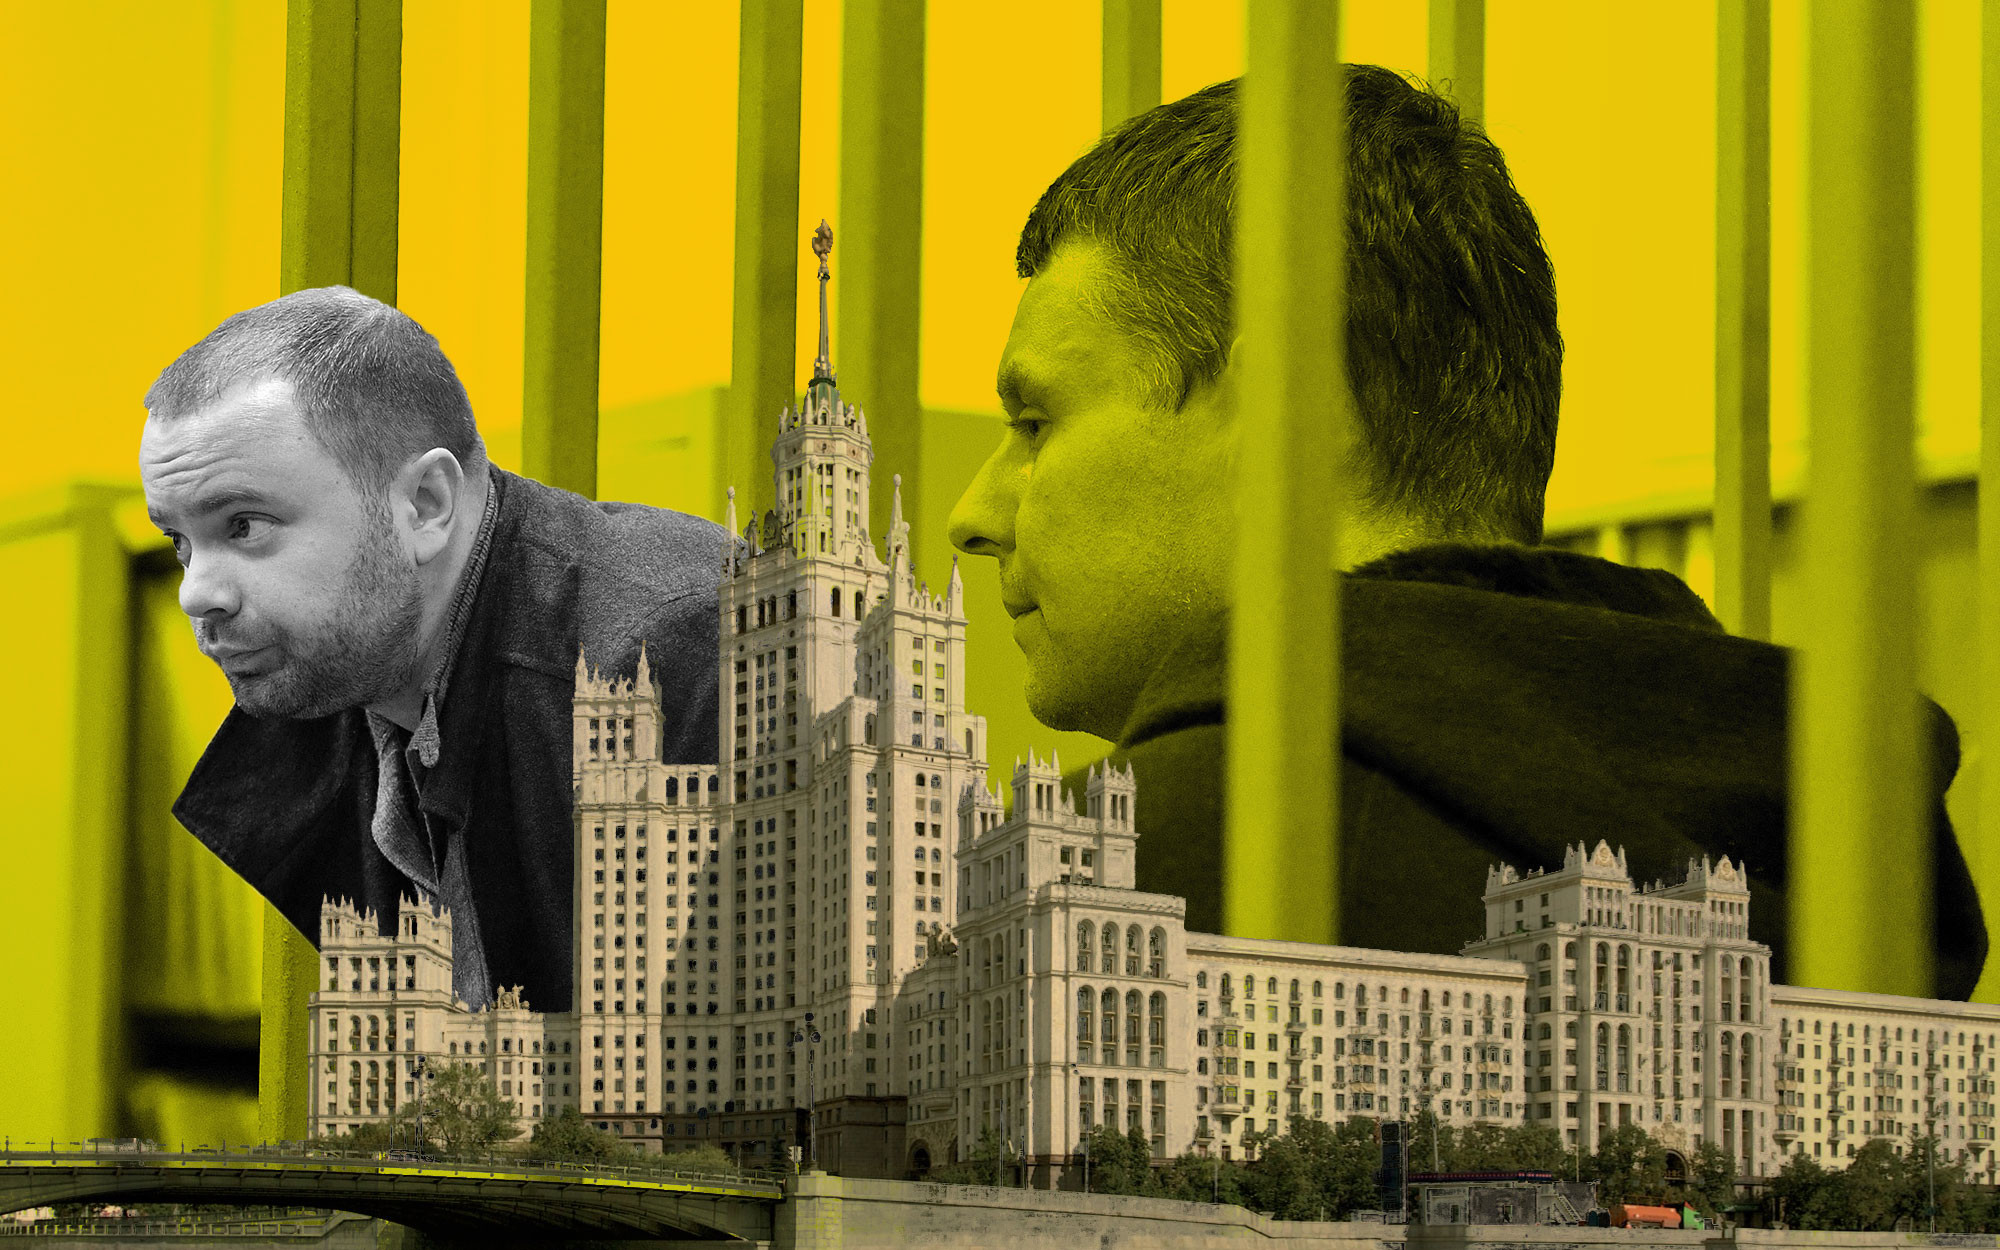 "<p>Коллаж &copy; L!FE &nbsp;Фото: &copy; РИА Новости /&nbsp;<span>Владимир Песня, <a href=""https://www.flickr.com/photos/mvstang/9920140506/"" target=""_blank"">flickr /&nbsp;Gennady Grachev</a></span></p>"